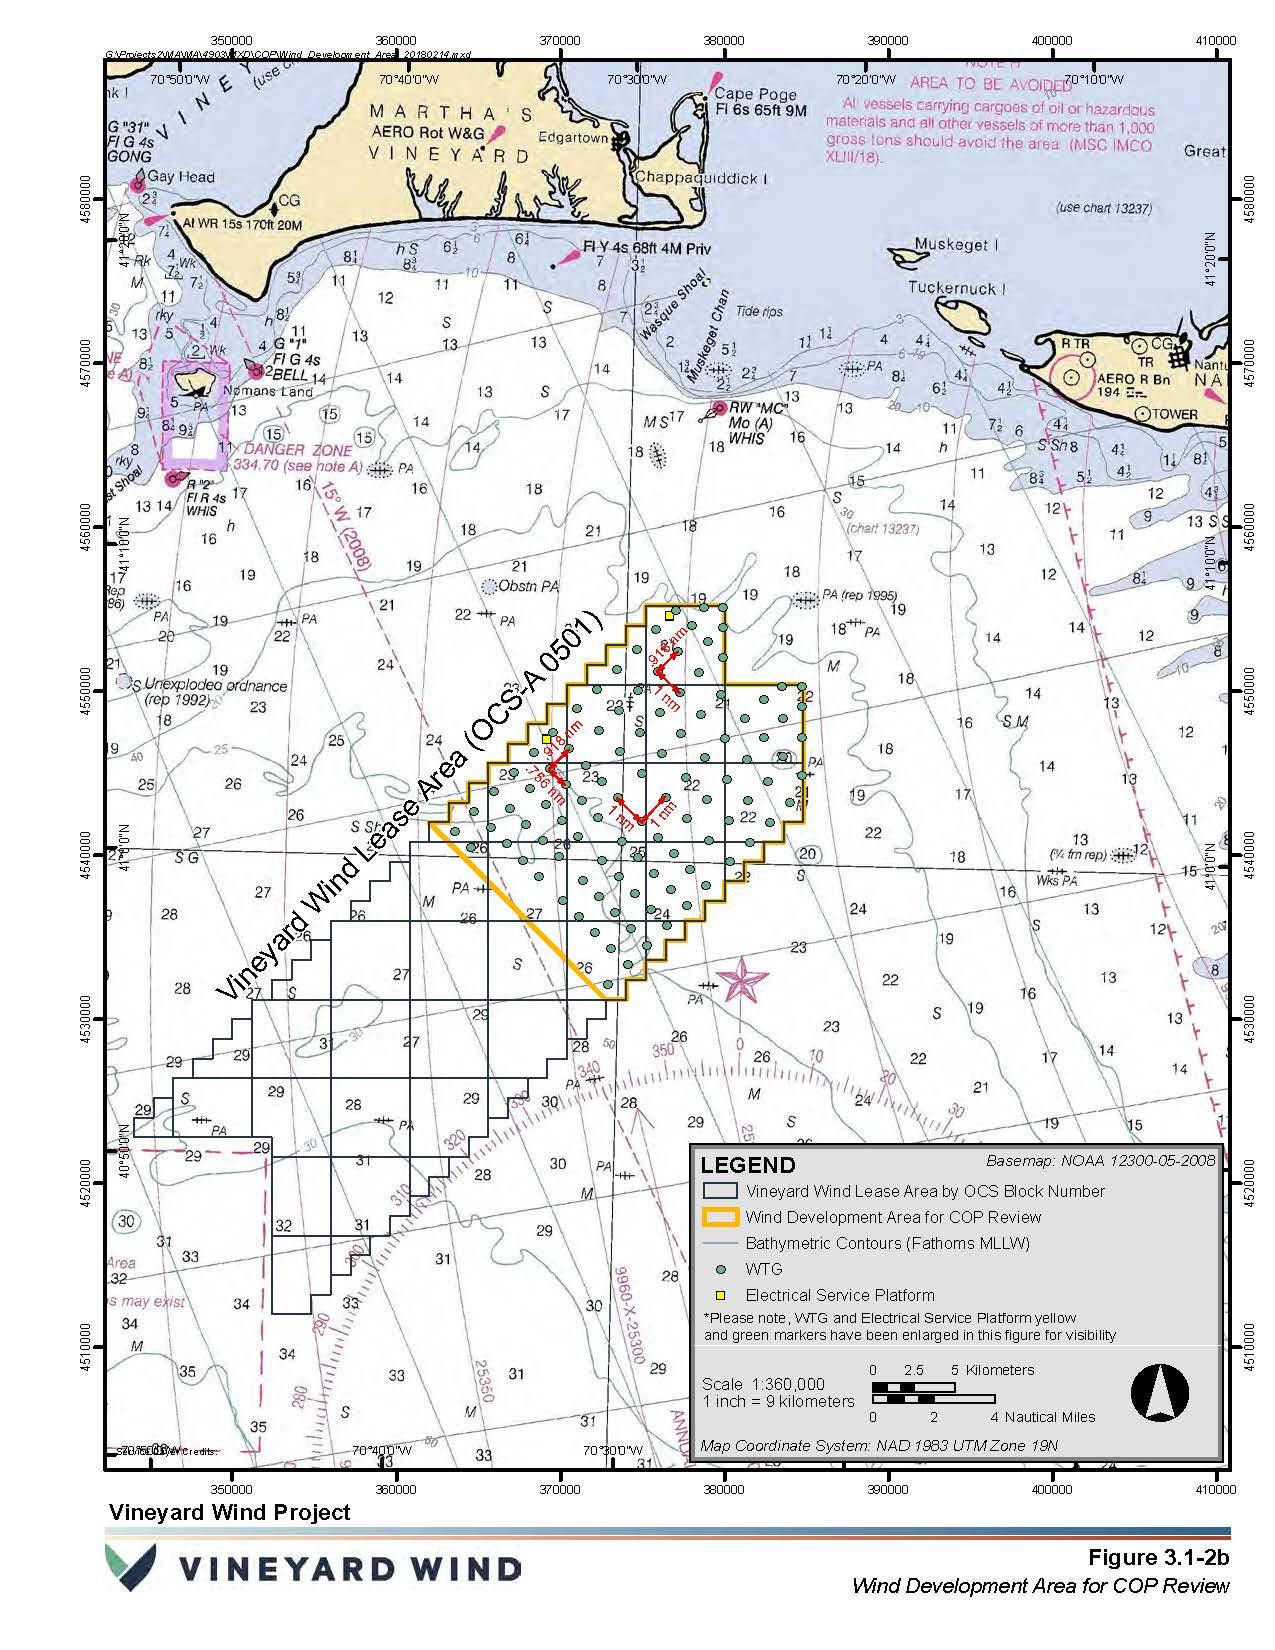 Vineyard Wind | Bureau of Ocean Energy Management